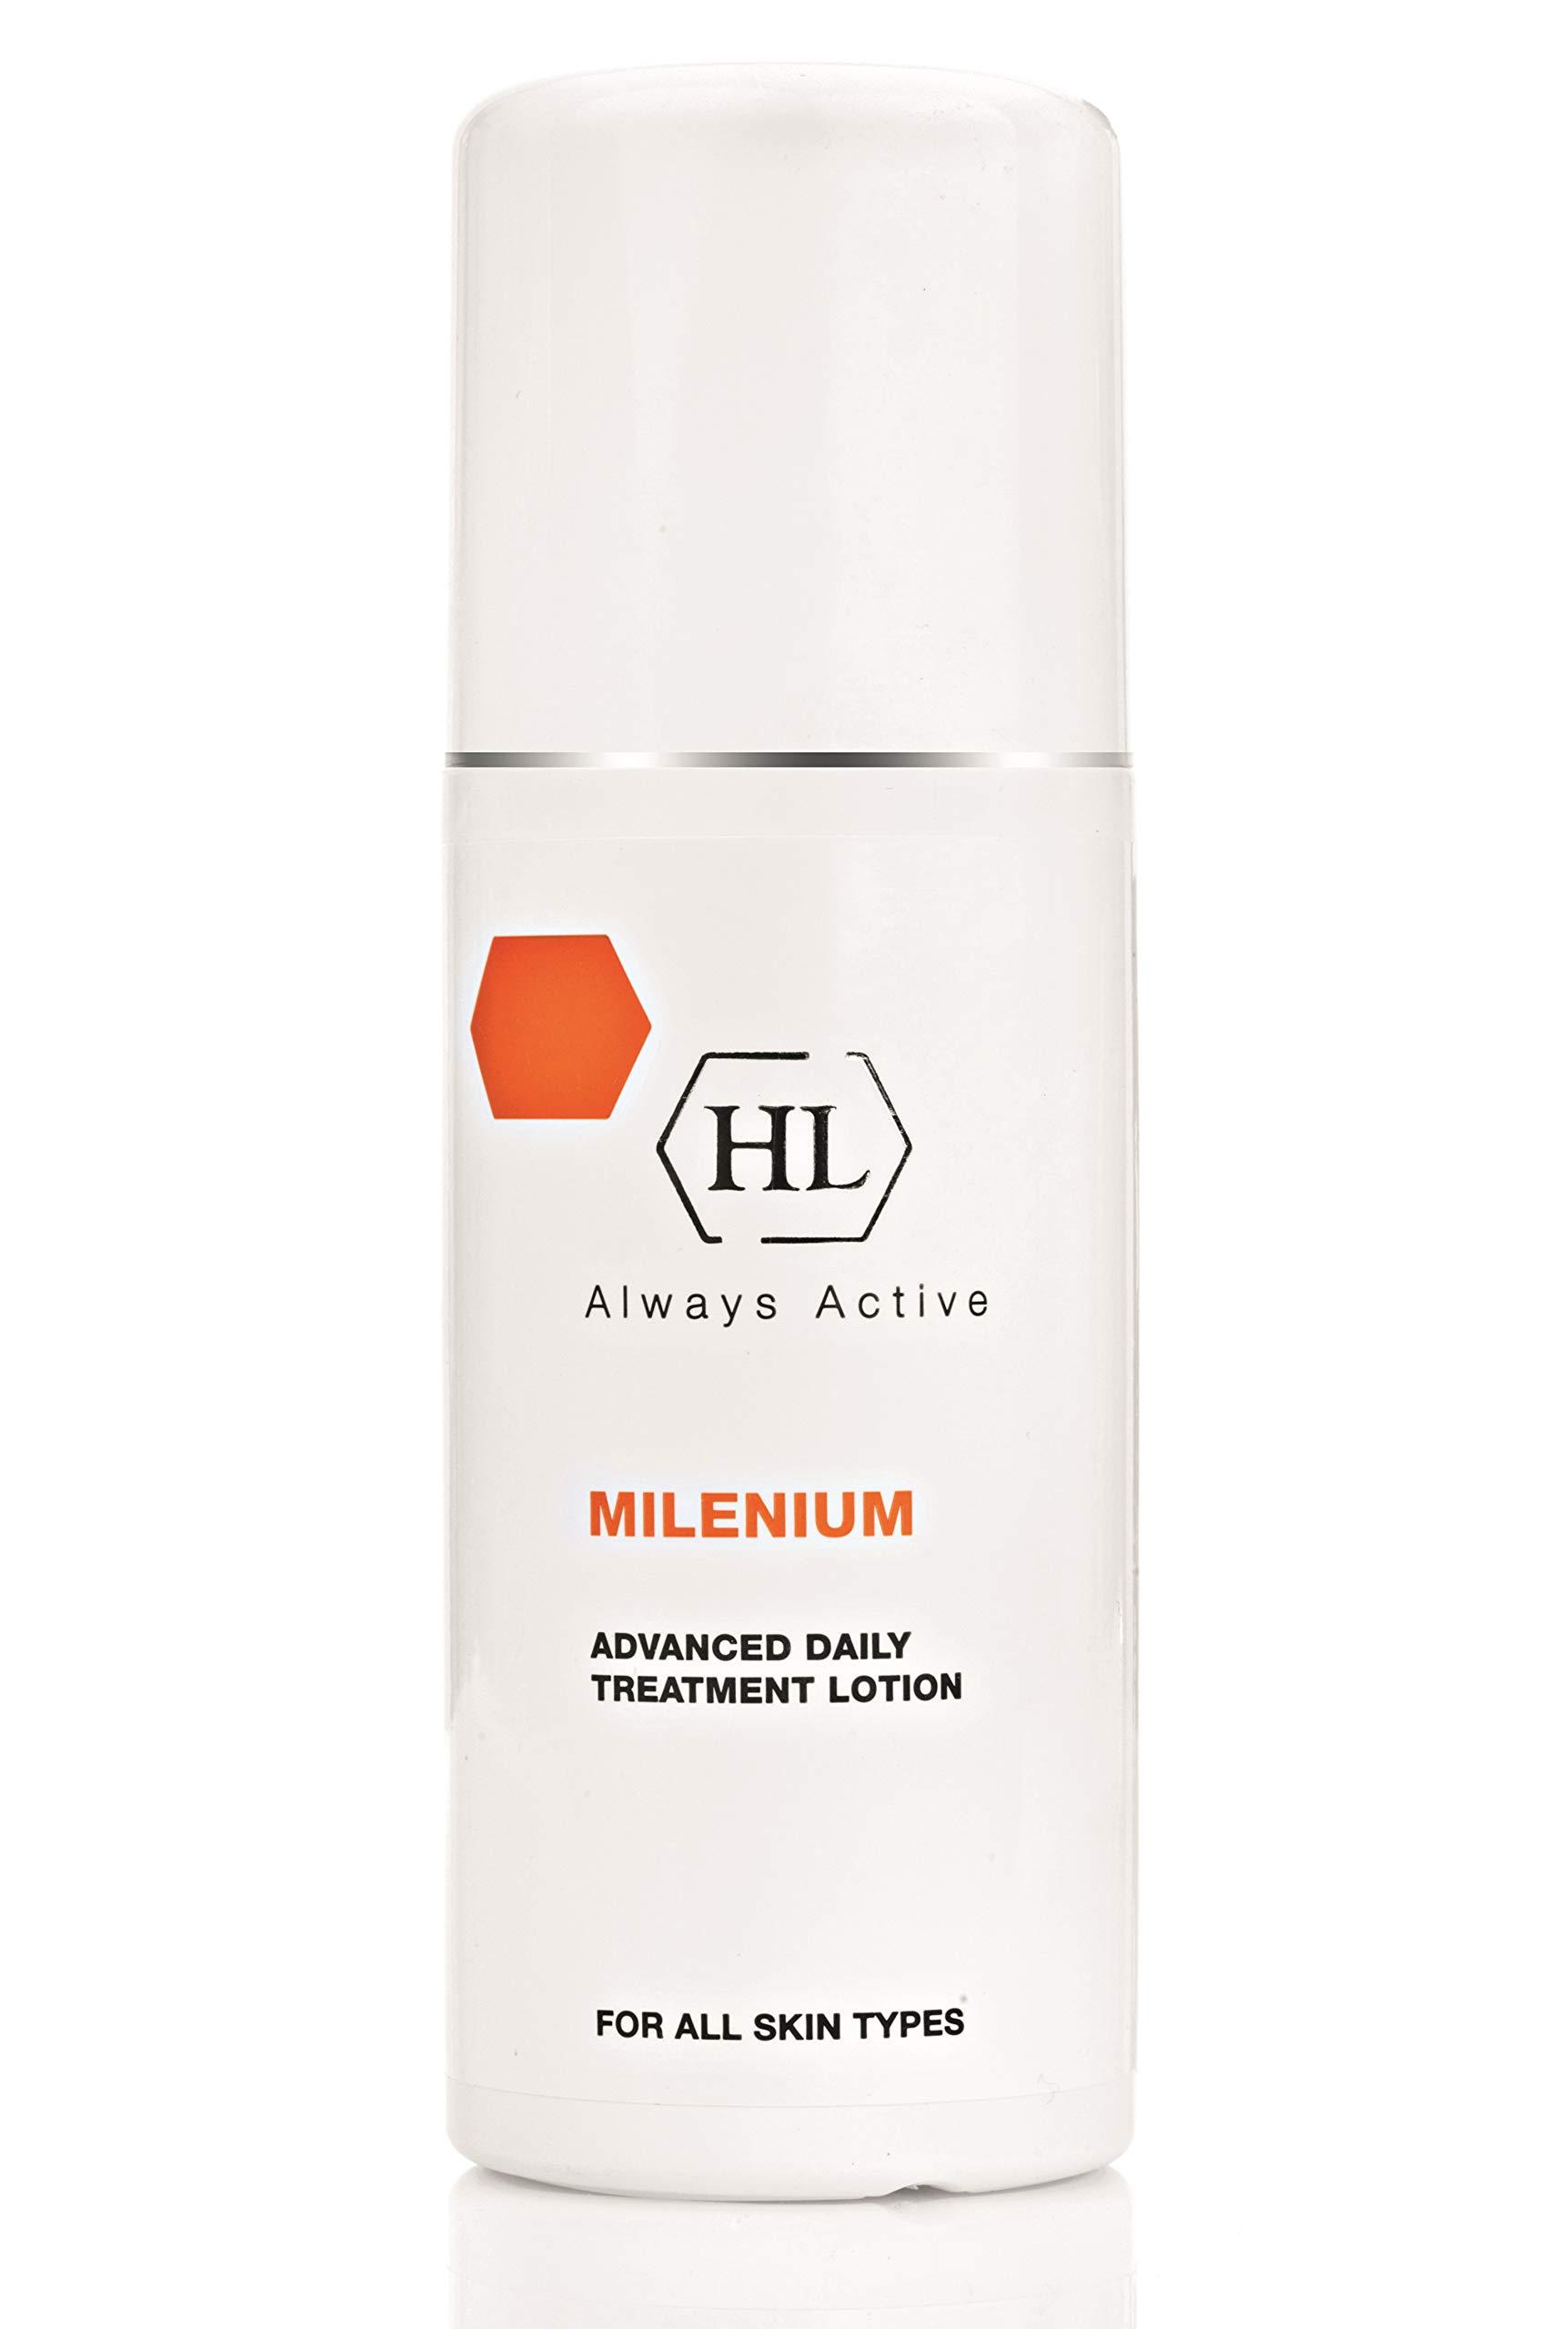 HL Holy Land Cosmetics Milenium Advanced Daily Treatment Super Lotion, Unique Formula Increases Moisture, Leaves Skin Clean & Fresh, 8.5 fl.oz